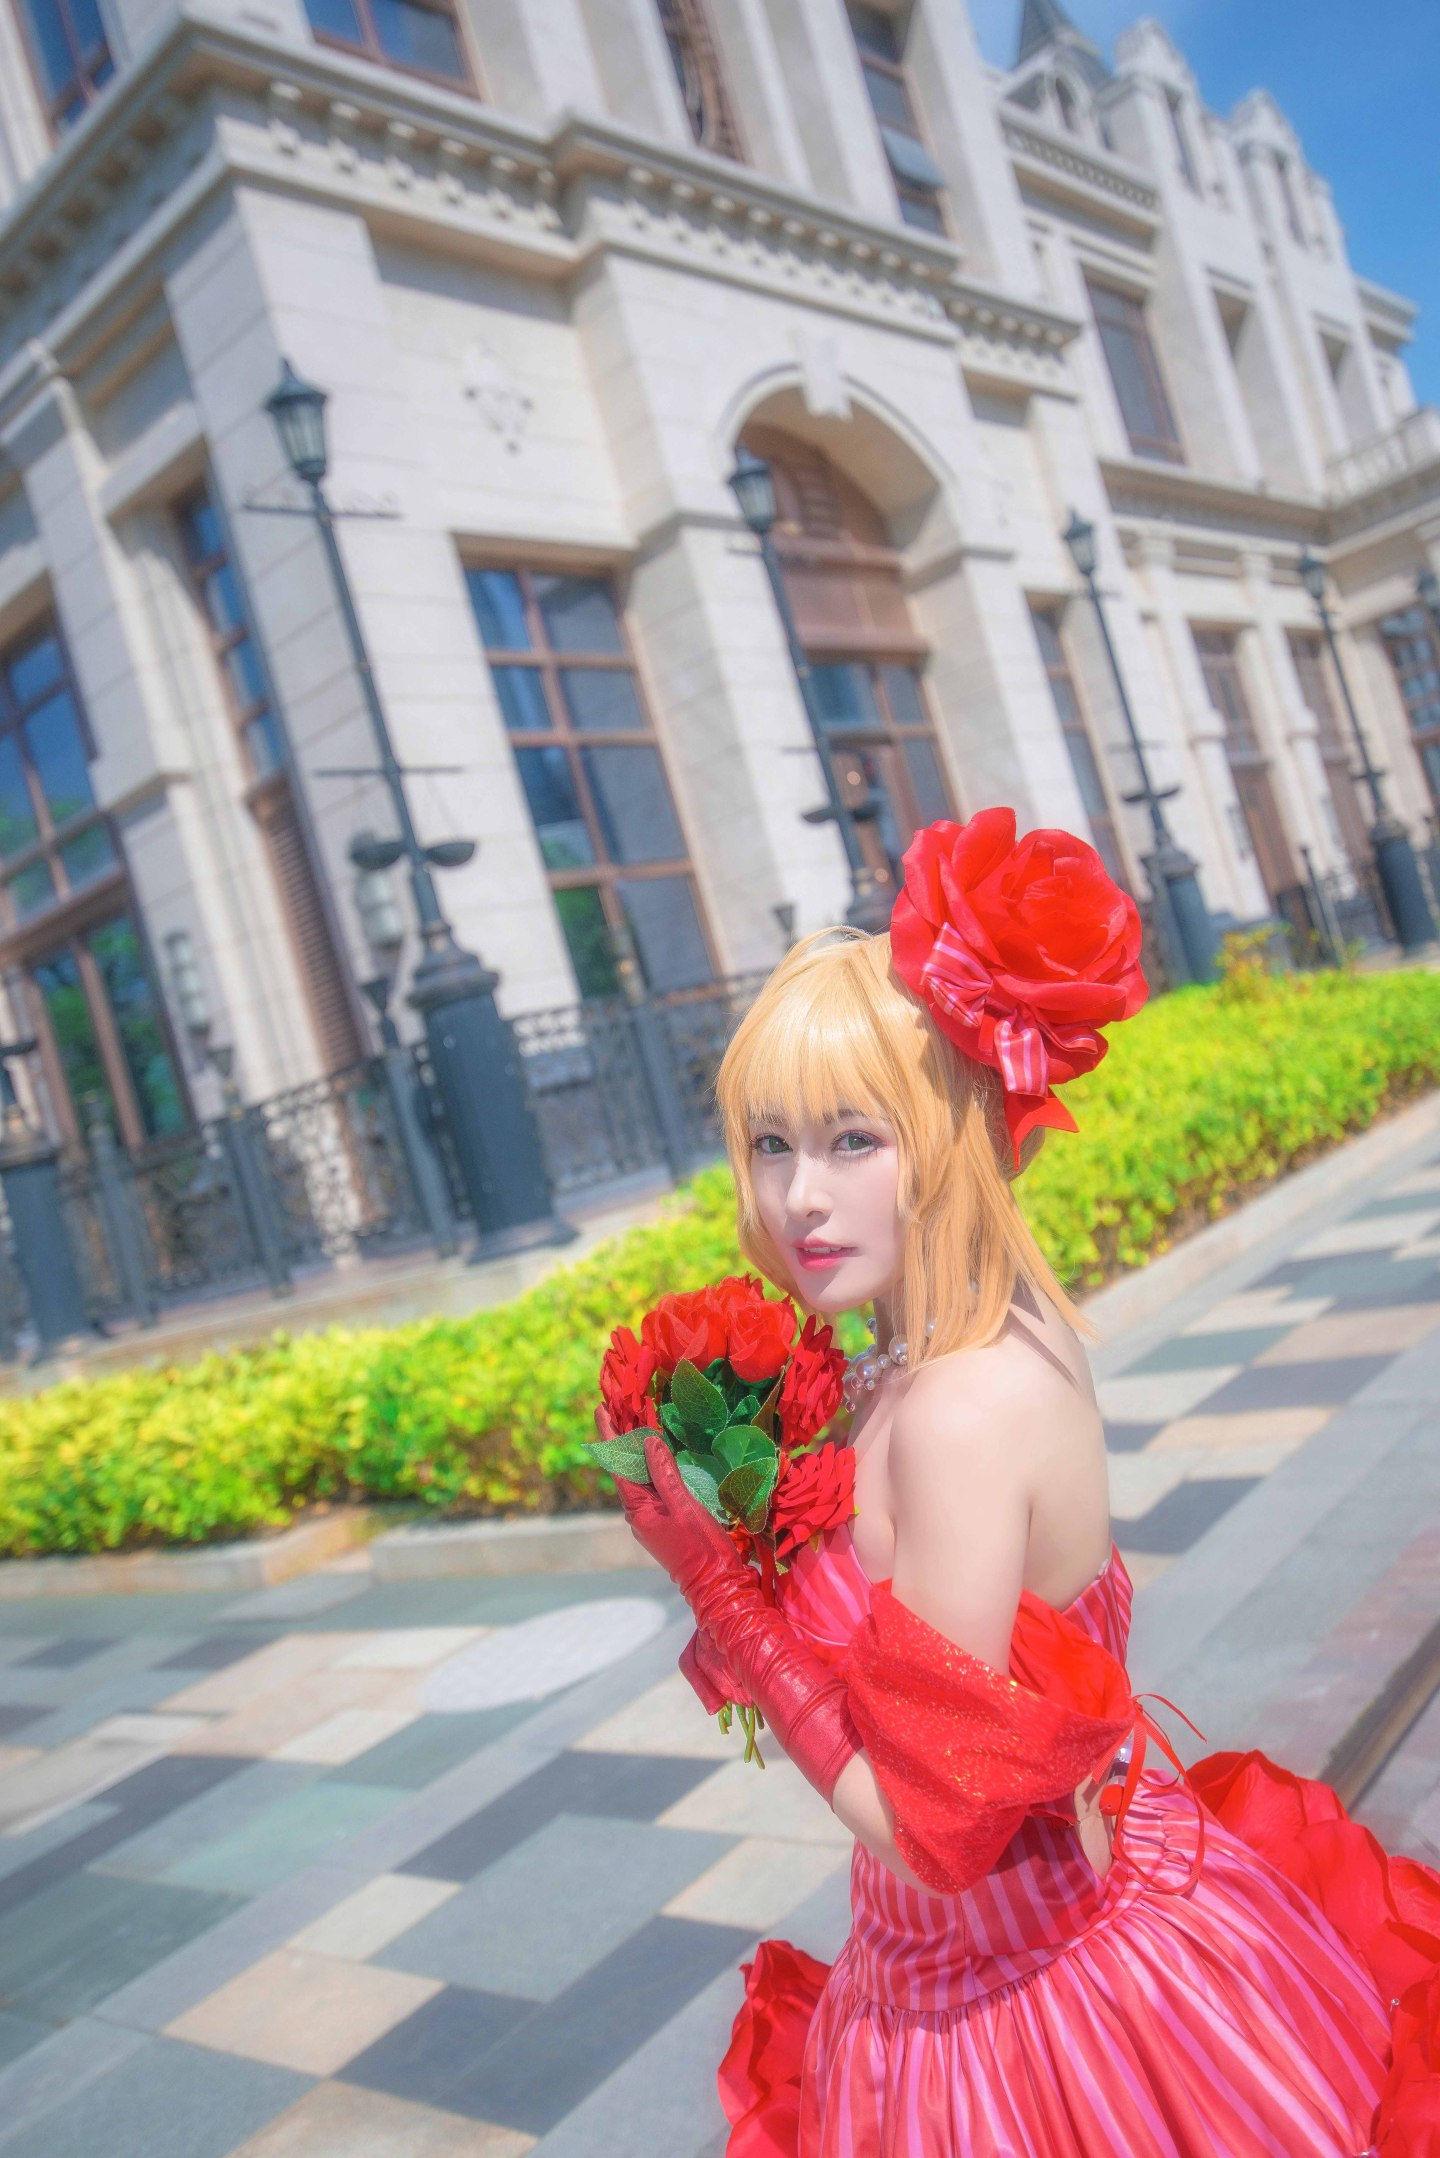 Fate/EXTRA 尼禄偶像皇帝手办ver cosplay插图(1)